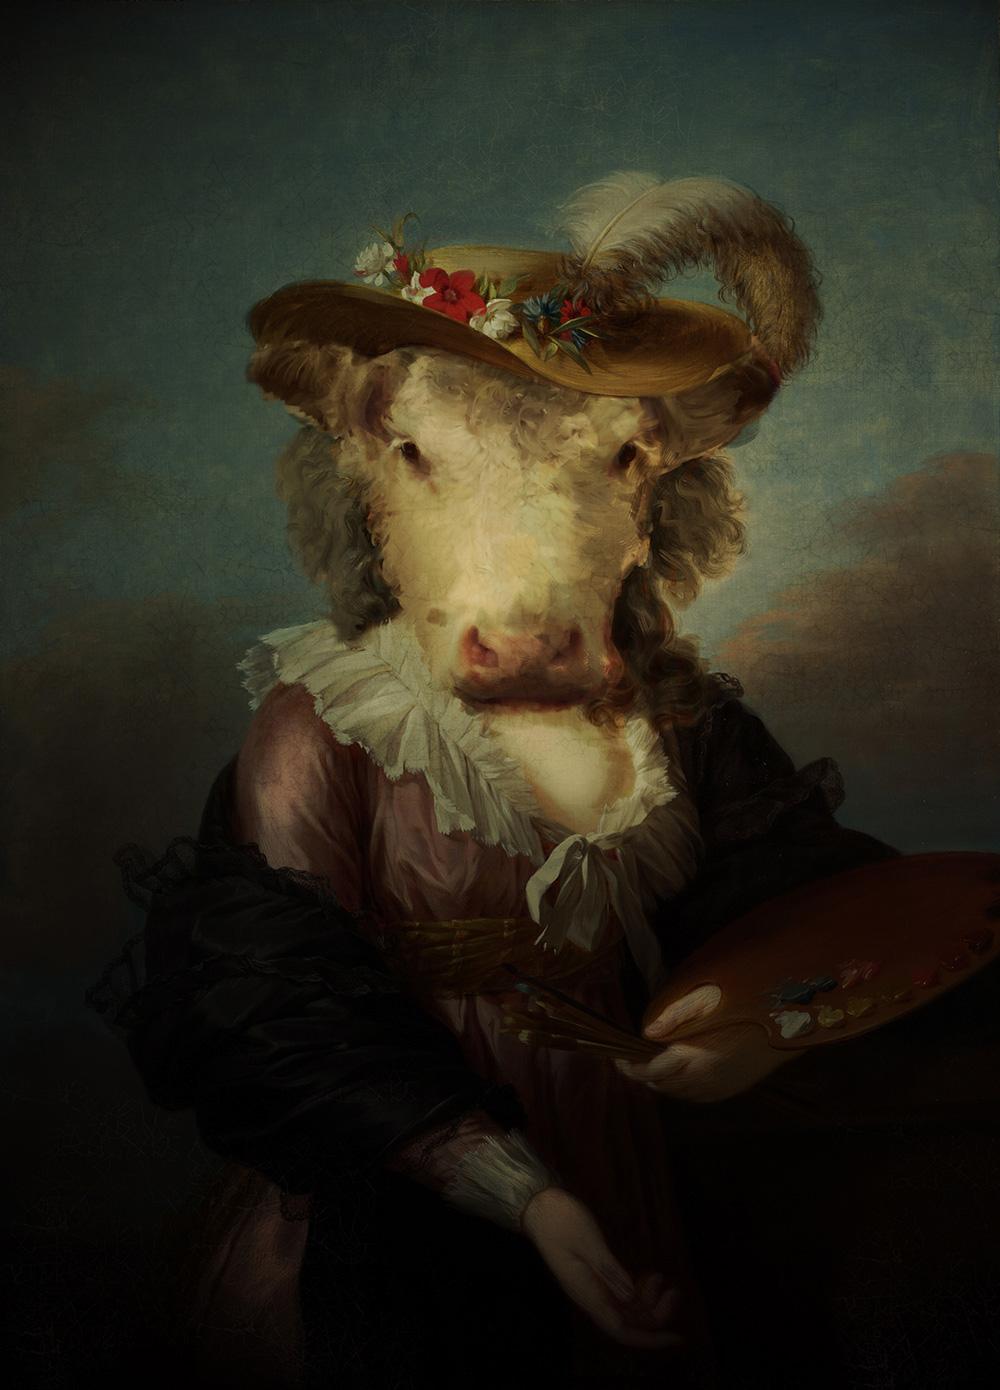 baroque rococo vinyl cd Classic colour vintage. Album cow  surreal package